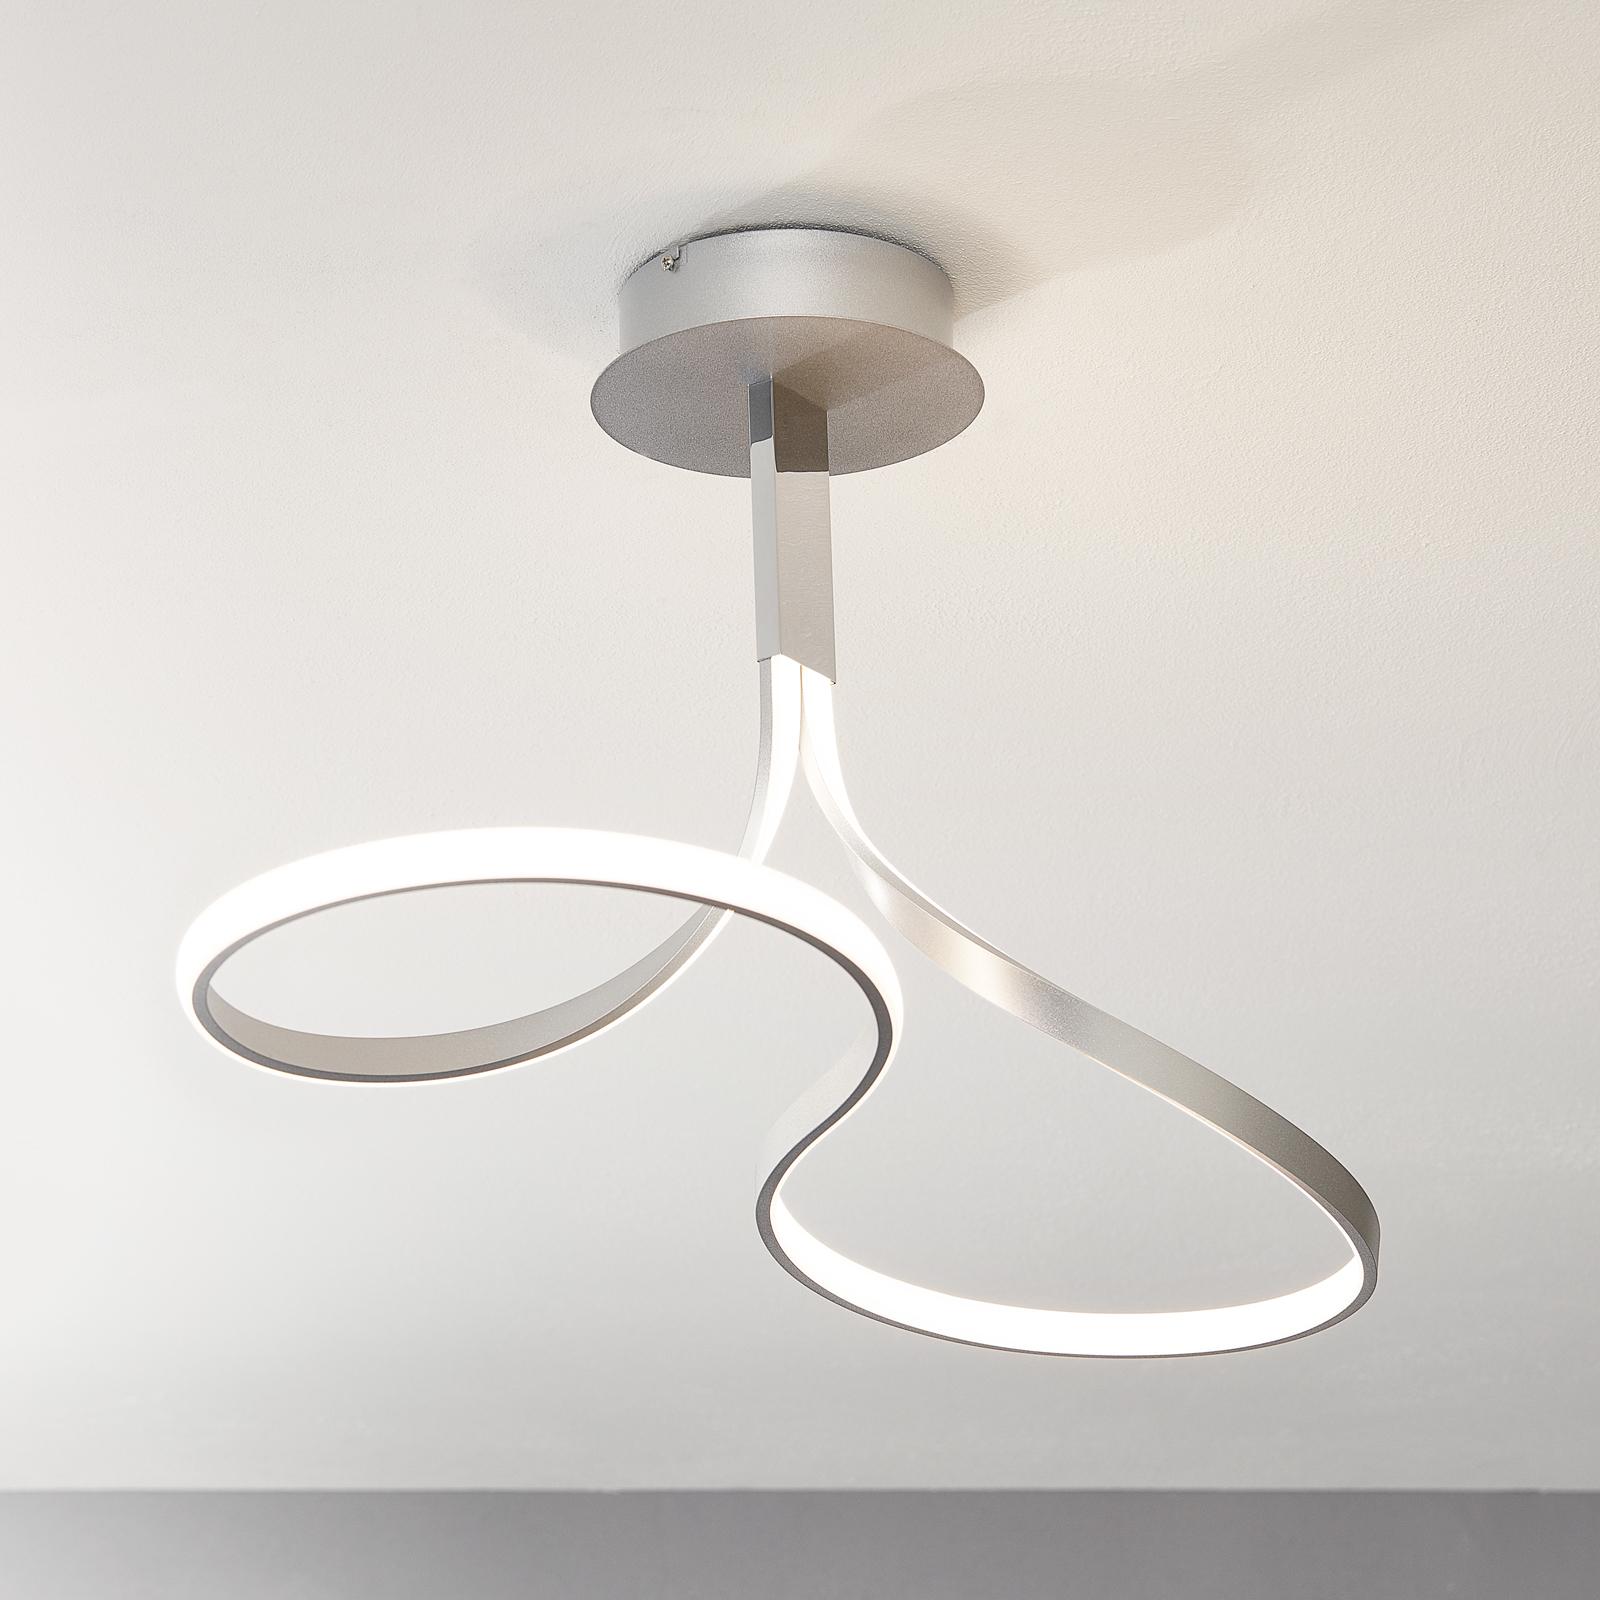 Beau plafonnier LED Nur